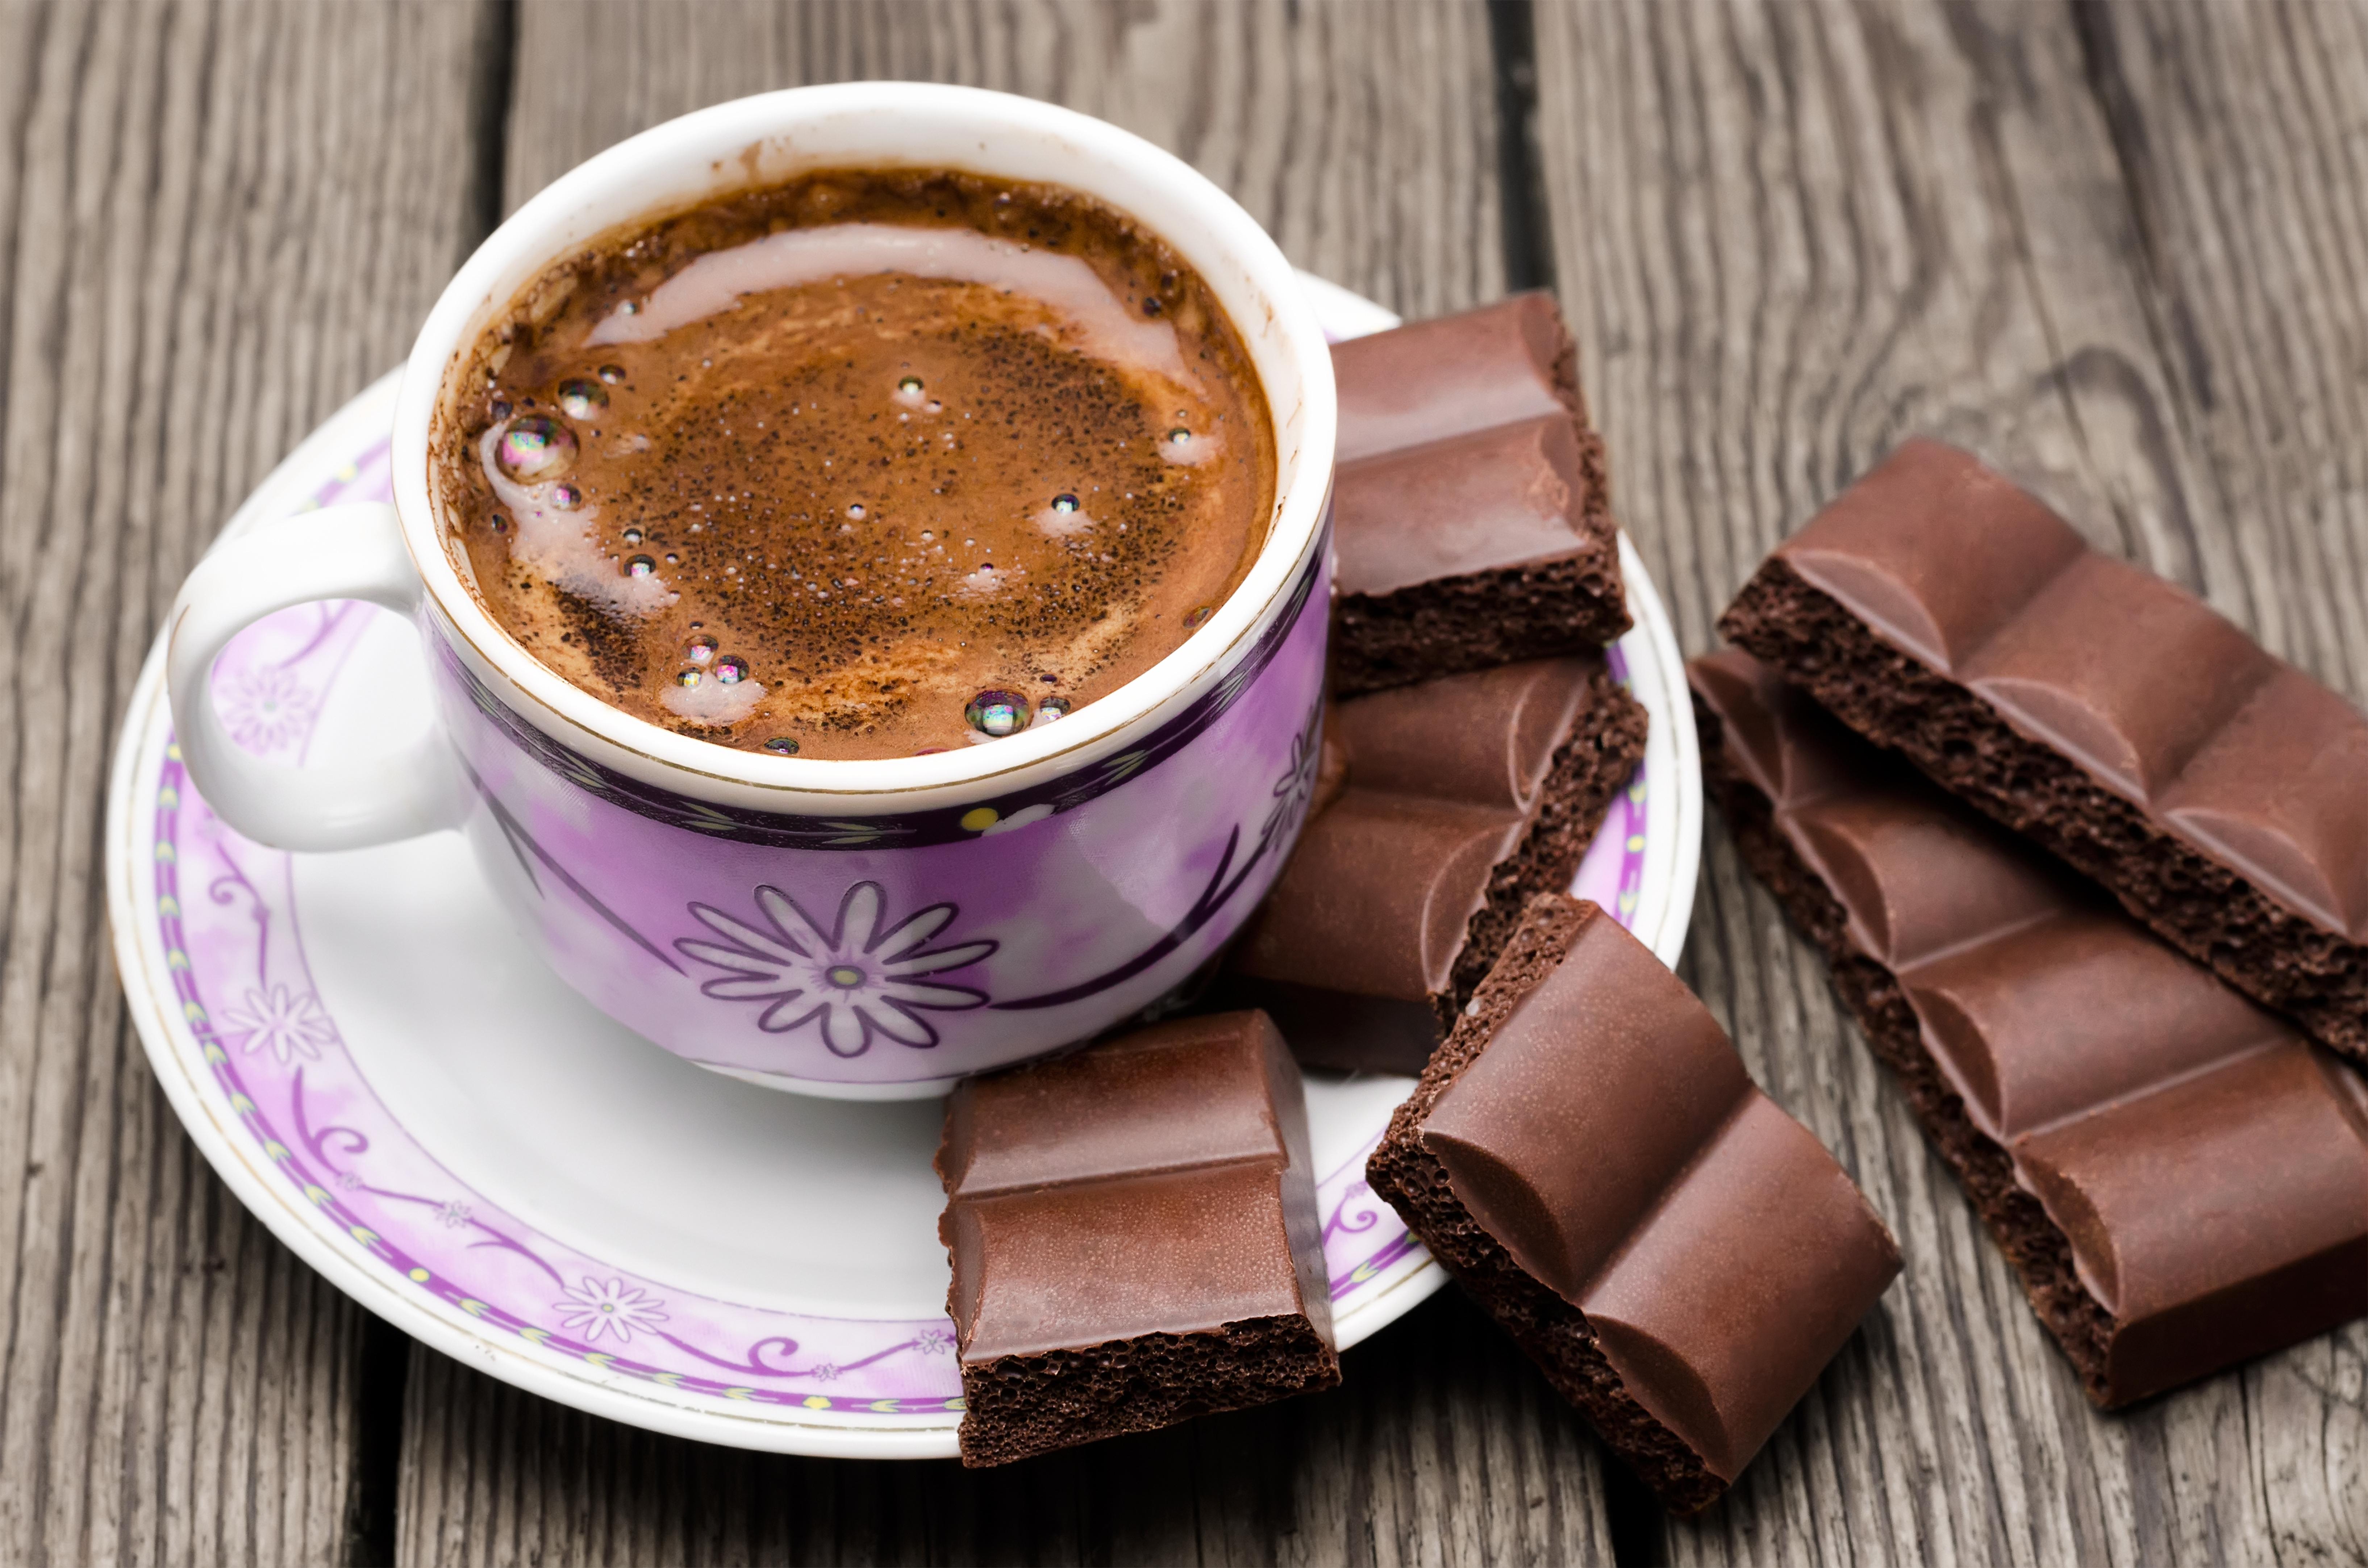 кофе со сладостями  № 140294 бесплатно